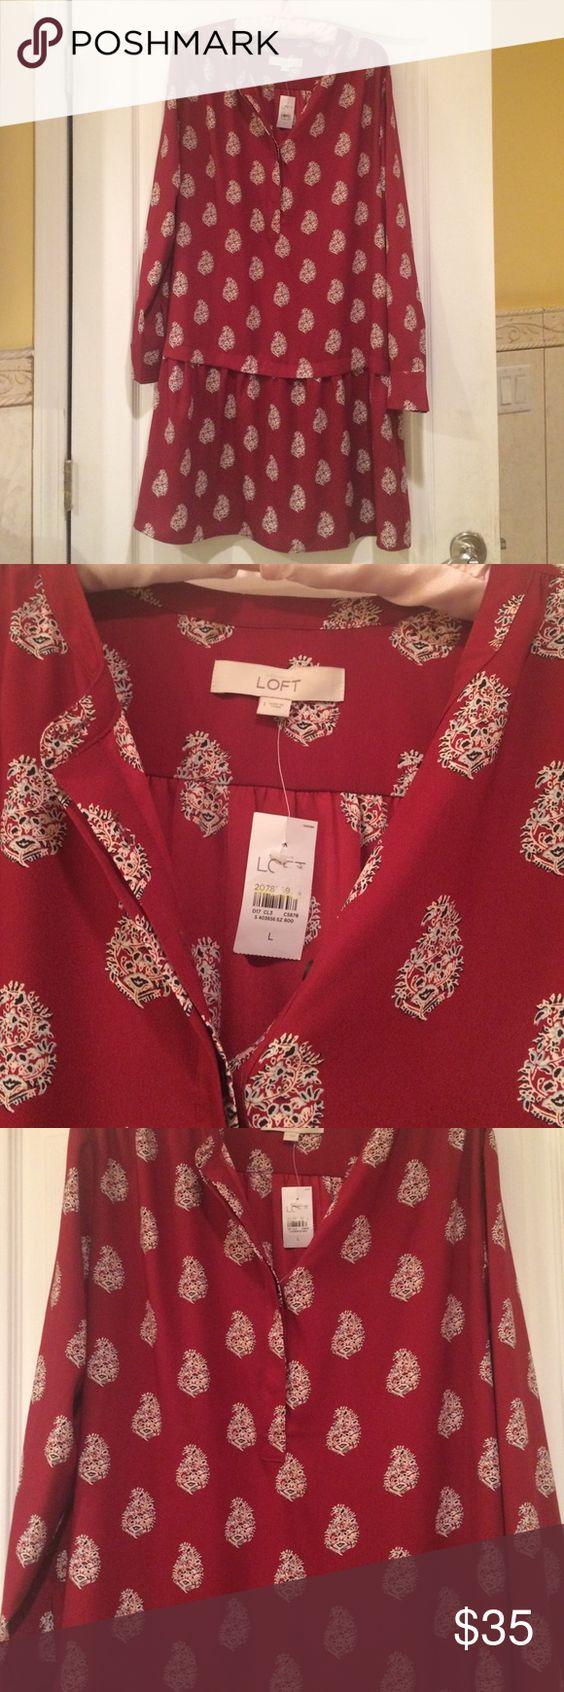 Loft Crimson shirt dress NWT large Crimson red with cream paisley design. LOFT Dresses Midi